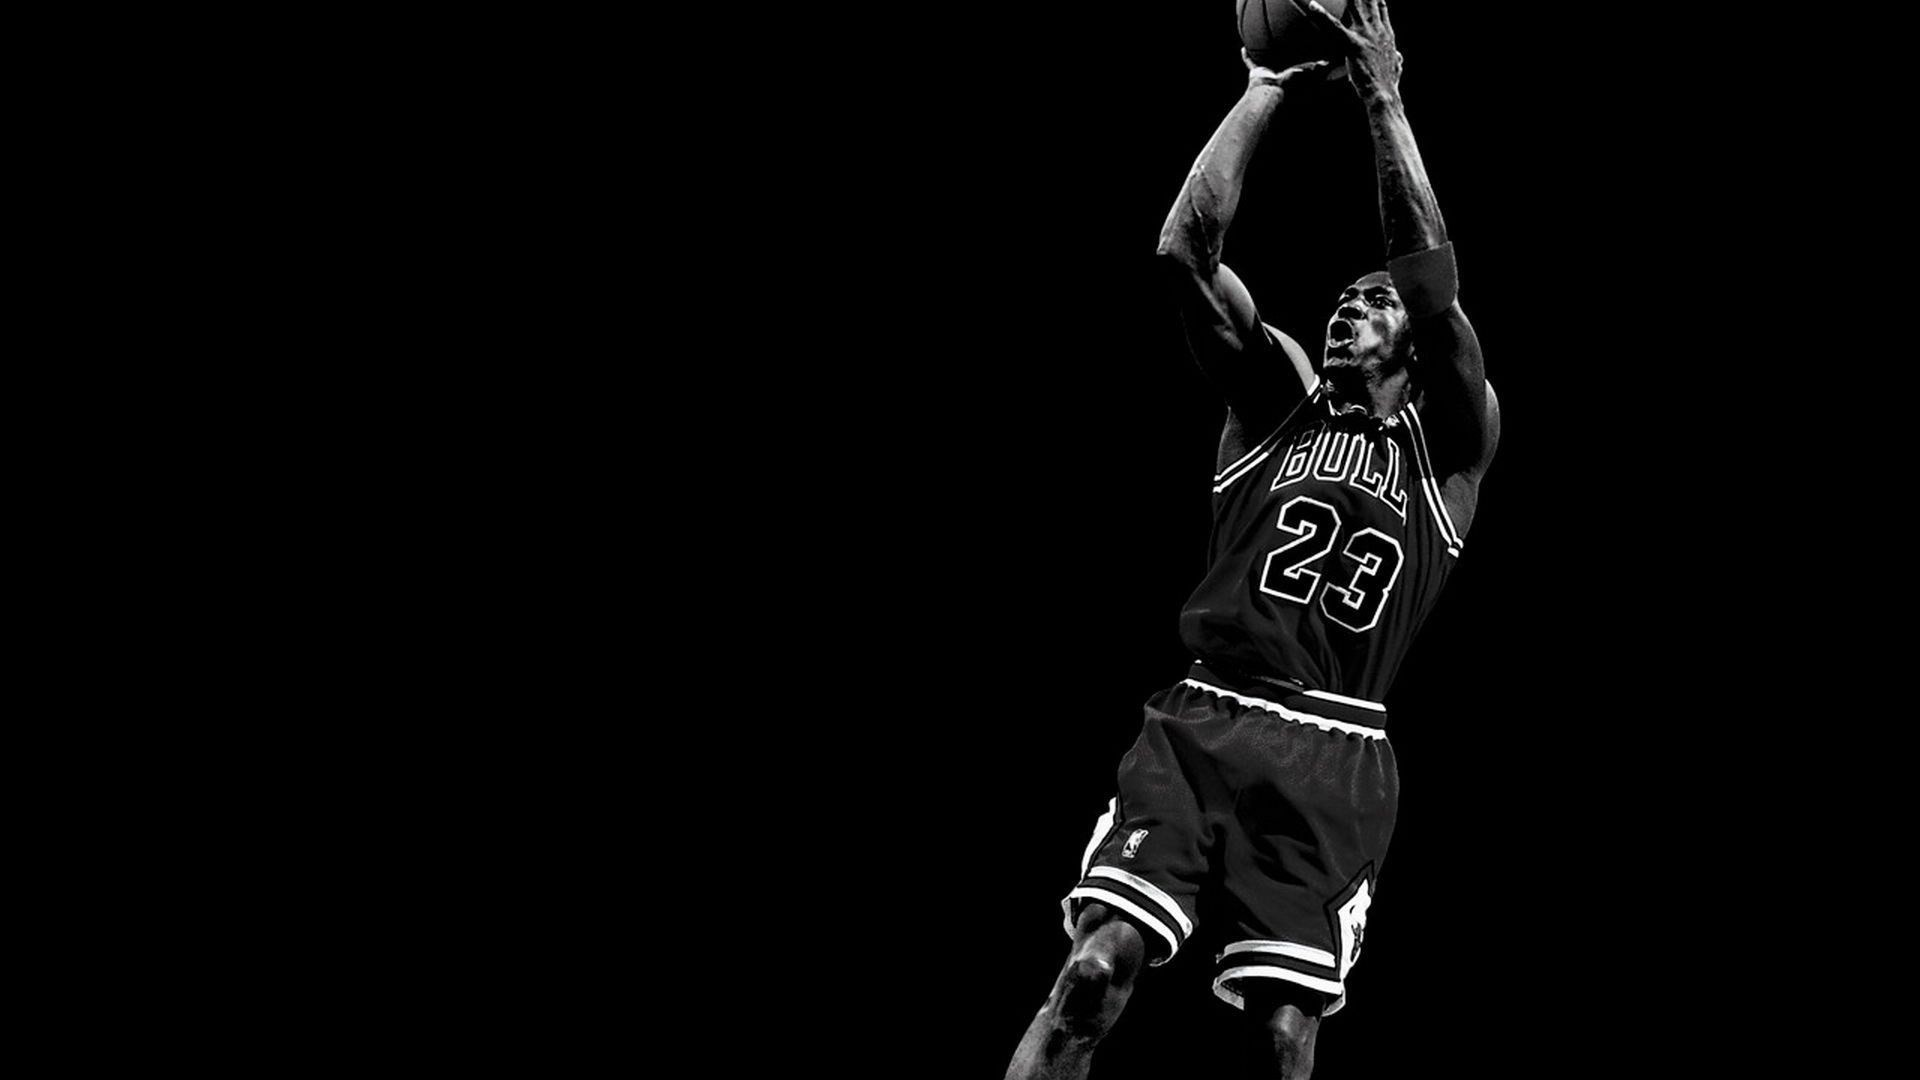 Cool Photo Michael Jordan HD Wallpaper Download Best Cool 1920×1080 Michael  Jordan Wallpapers 1080p (53 Wallpapers)   Adorable Wallpapers   Pinterest  …